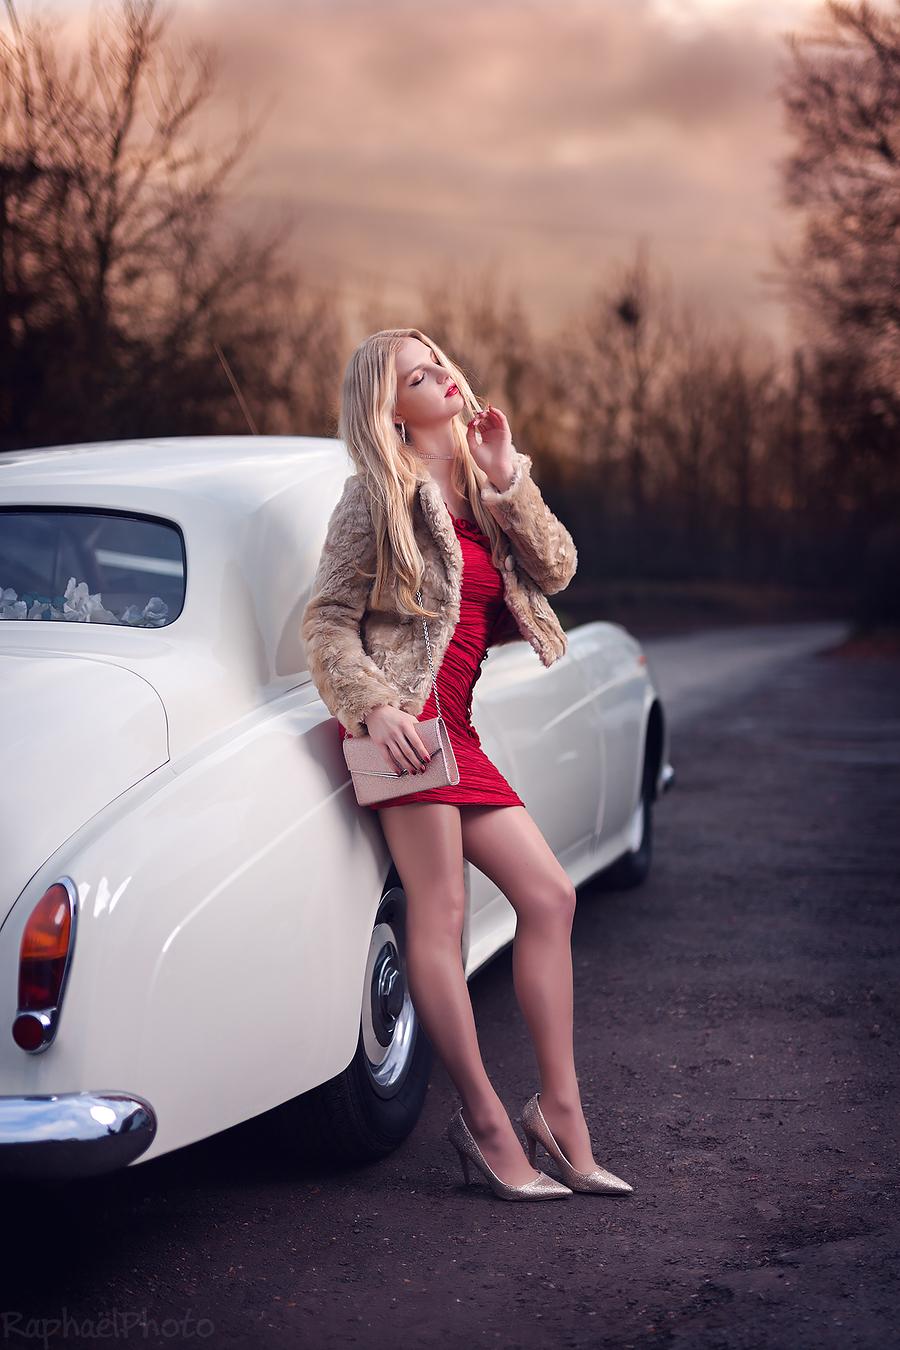 La vie est belle / Photography by RaphaelPhoto, Model Nadia Chloe Rose / Uploaded 6th December 2017 @ 10:41 PM